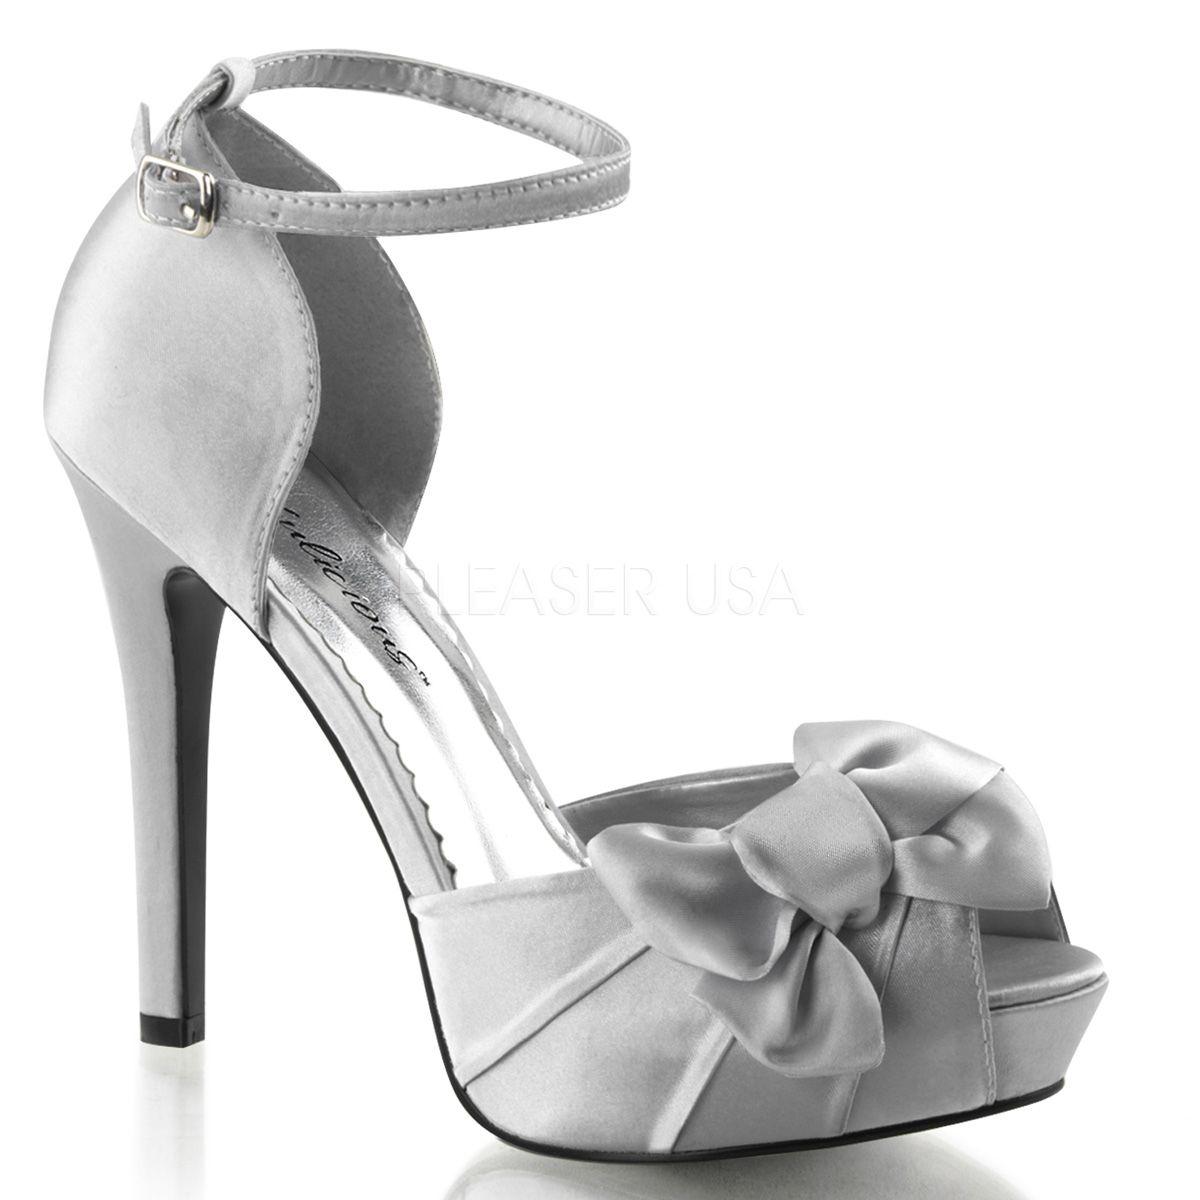 Fabulicious LUMINA-34 4 3/4 Inch Heel, 1 Inch PF Peep Toe d'Orsay Pump w/Floral